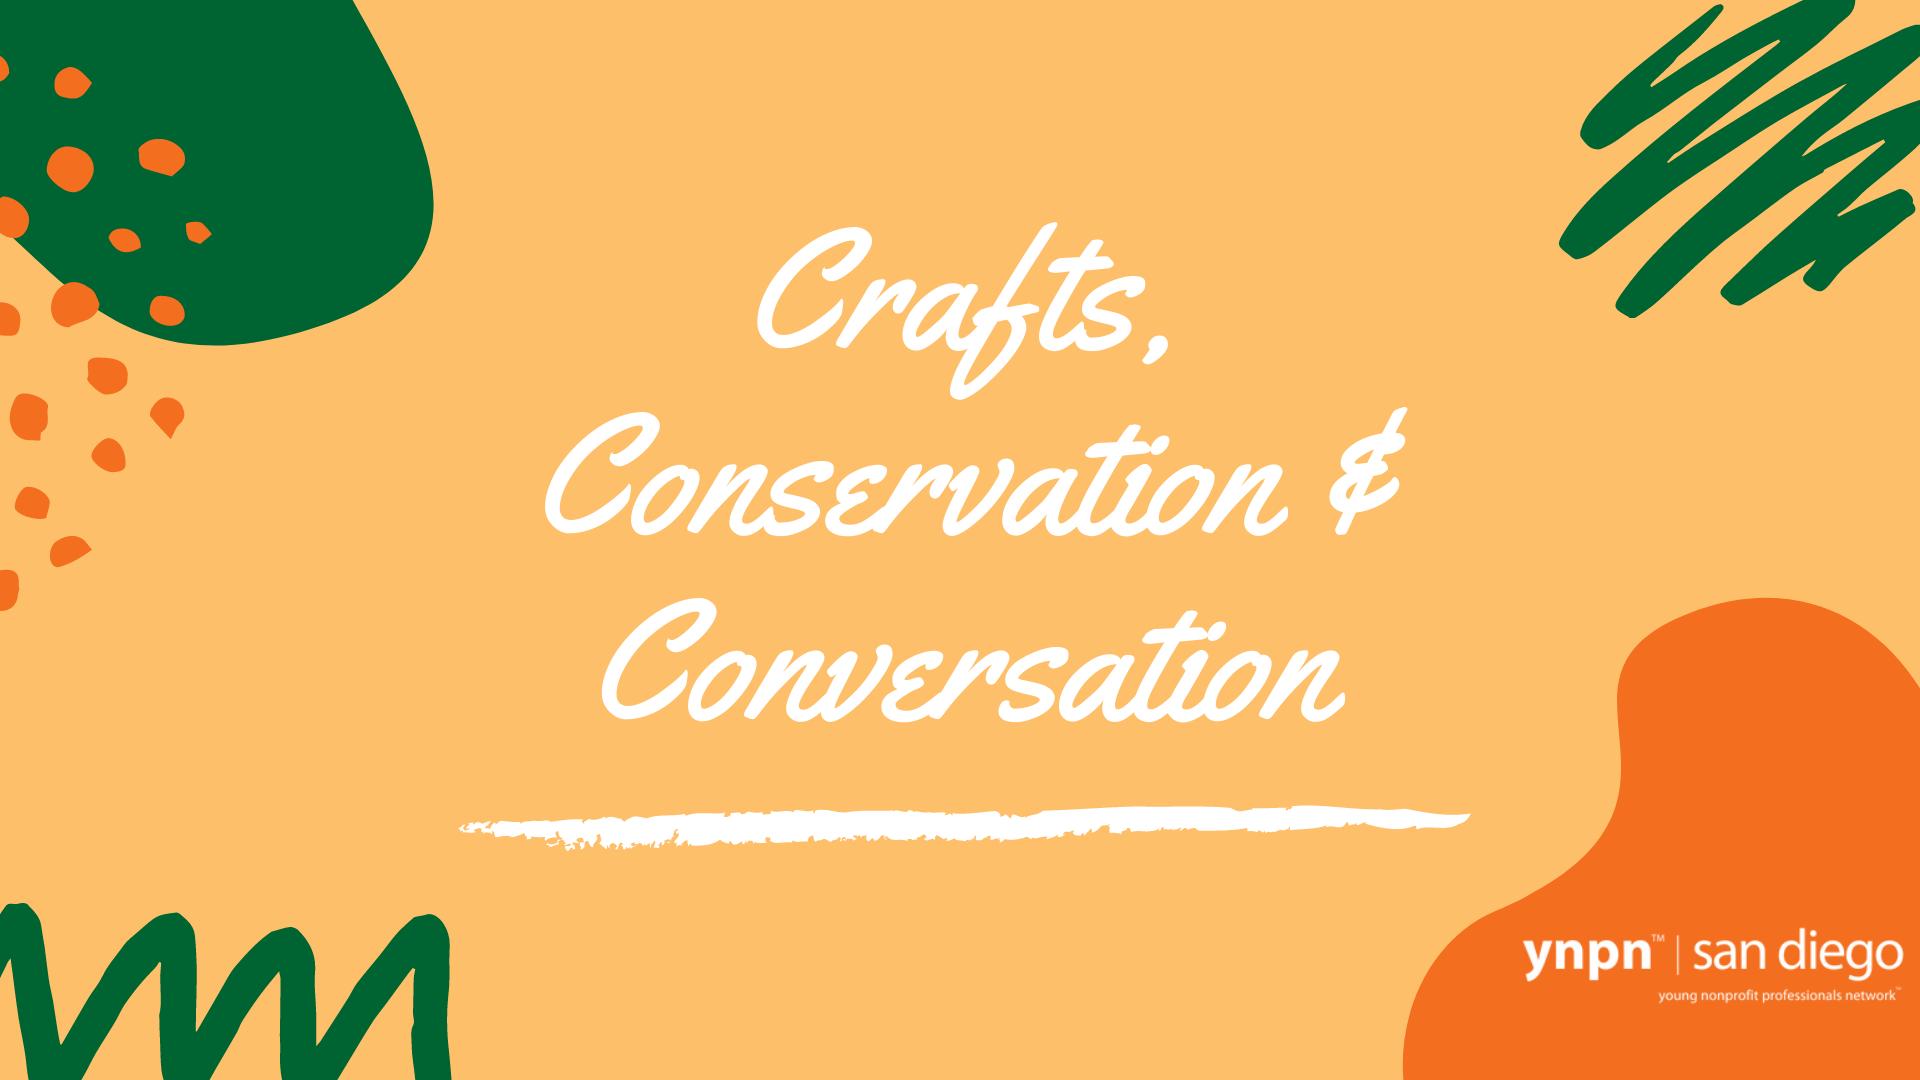 Crafts, Conservation & Conversation